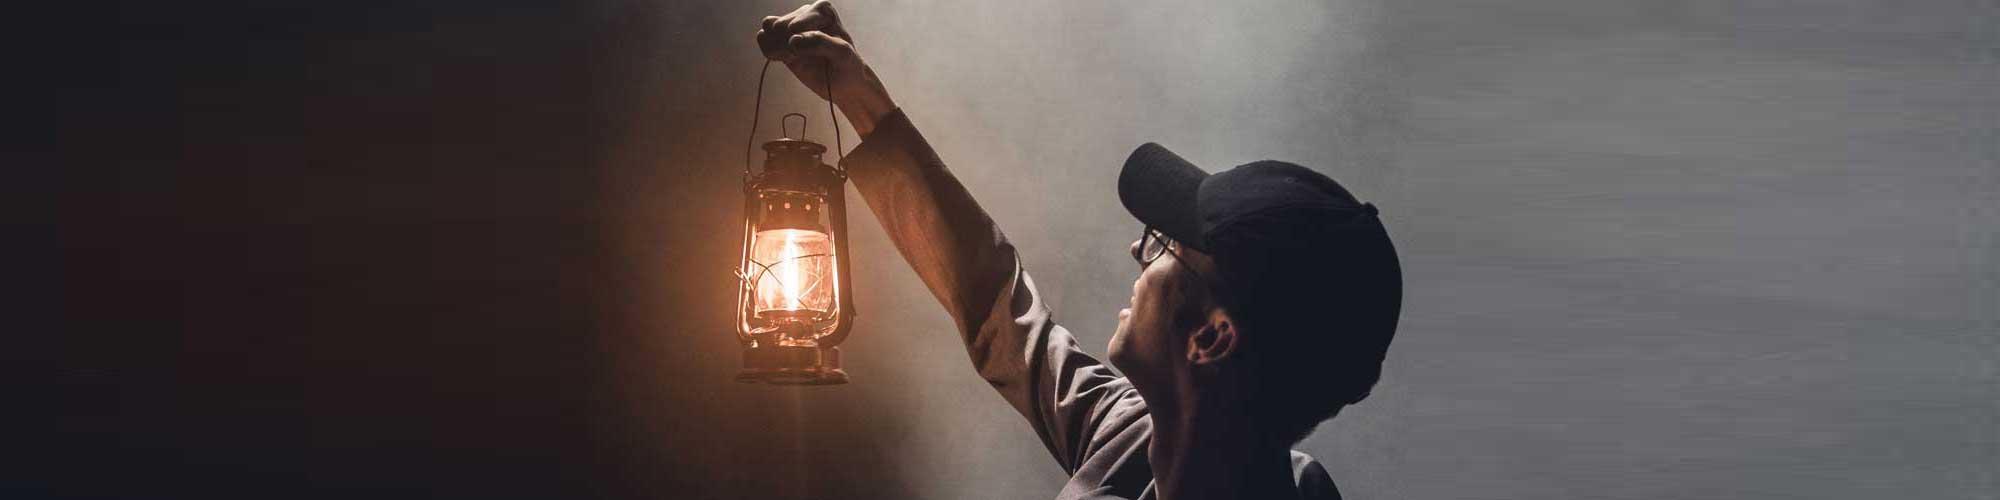 MAN-LIGHTING